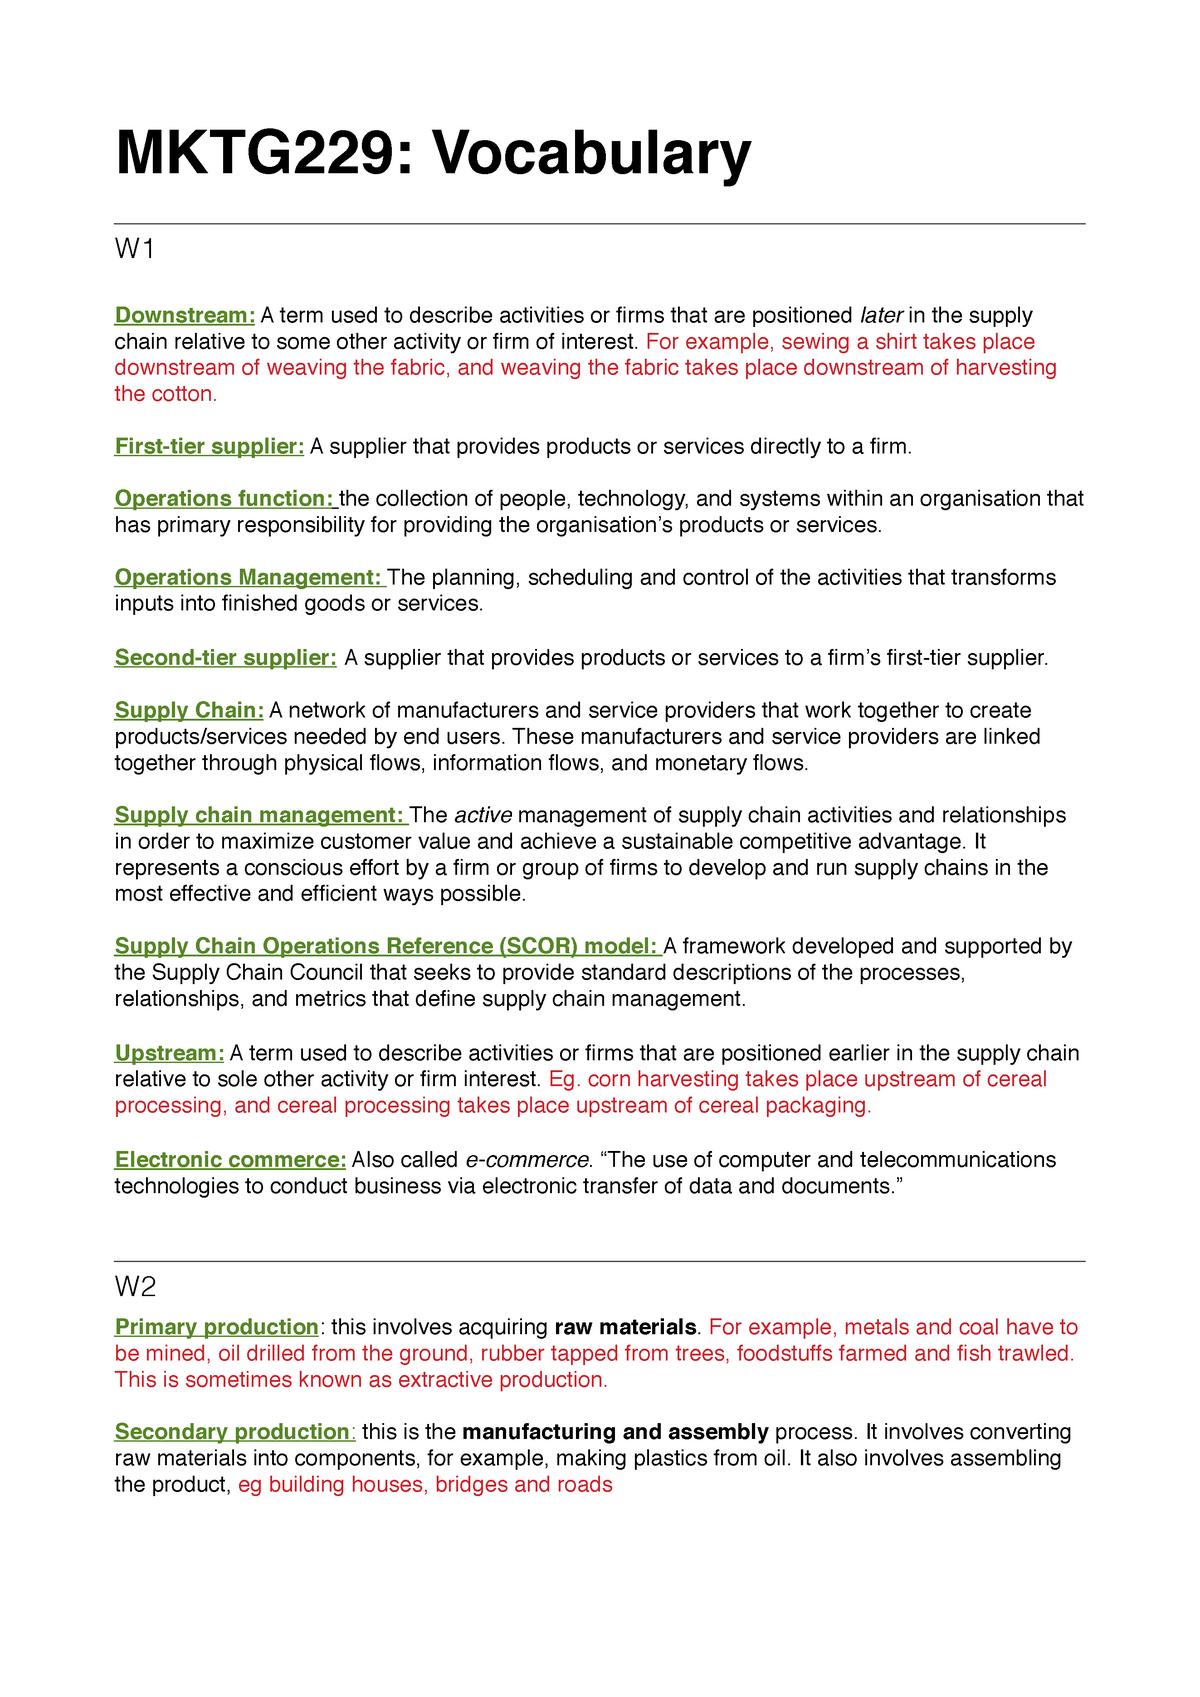 MKTG229-Vocabulary - Summary Routes to Market - MKTG229